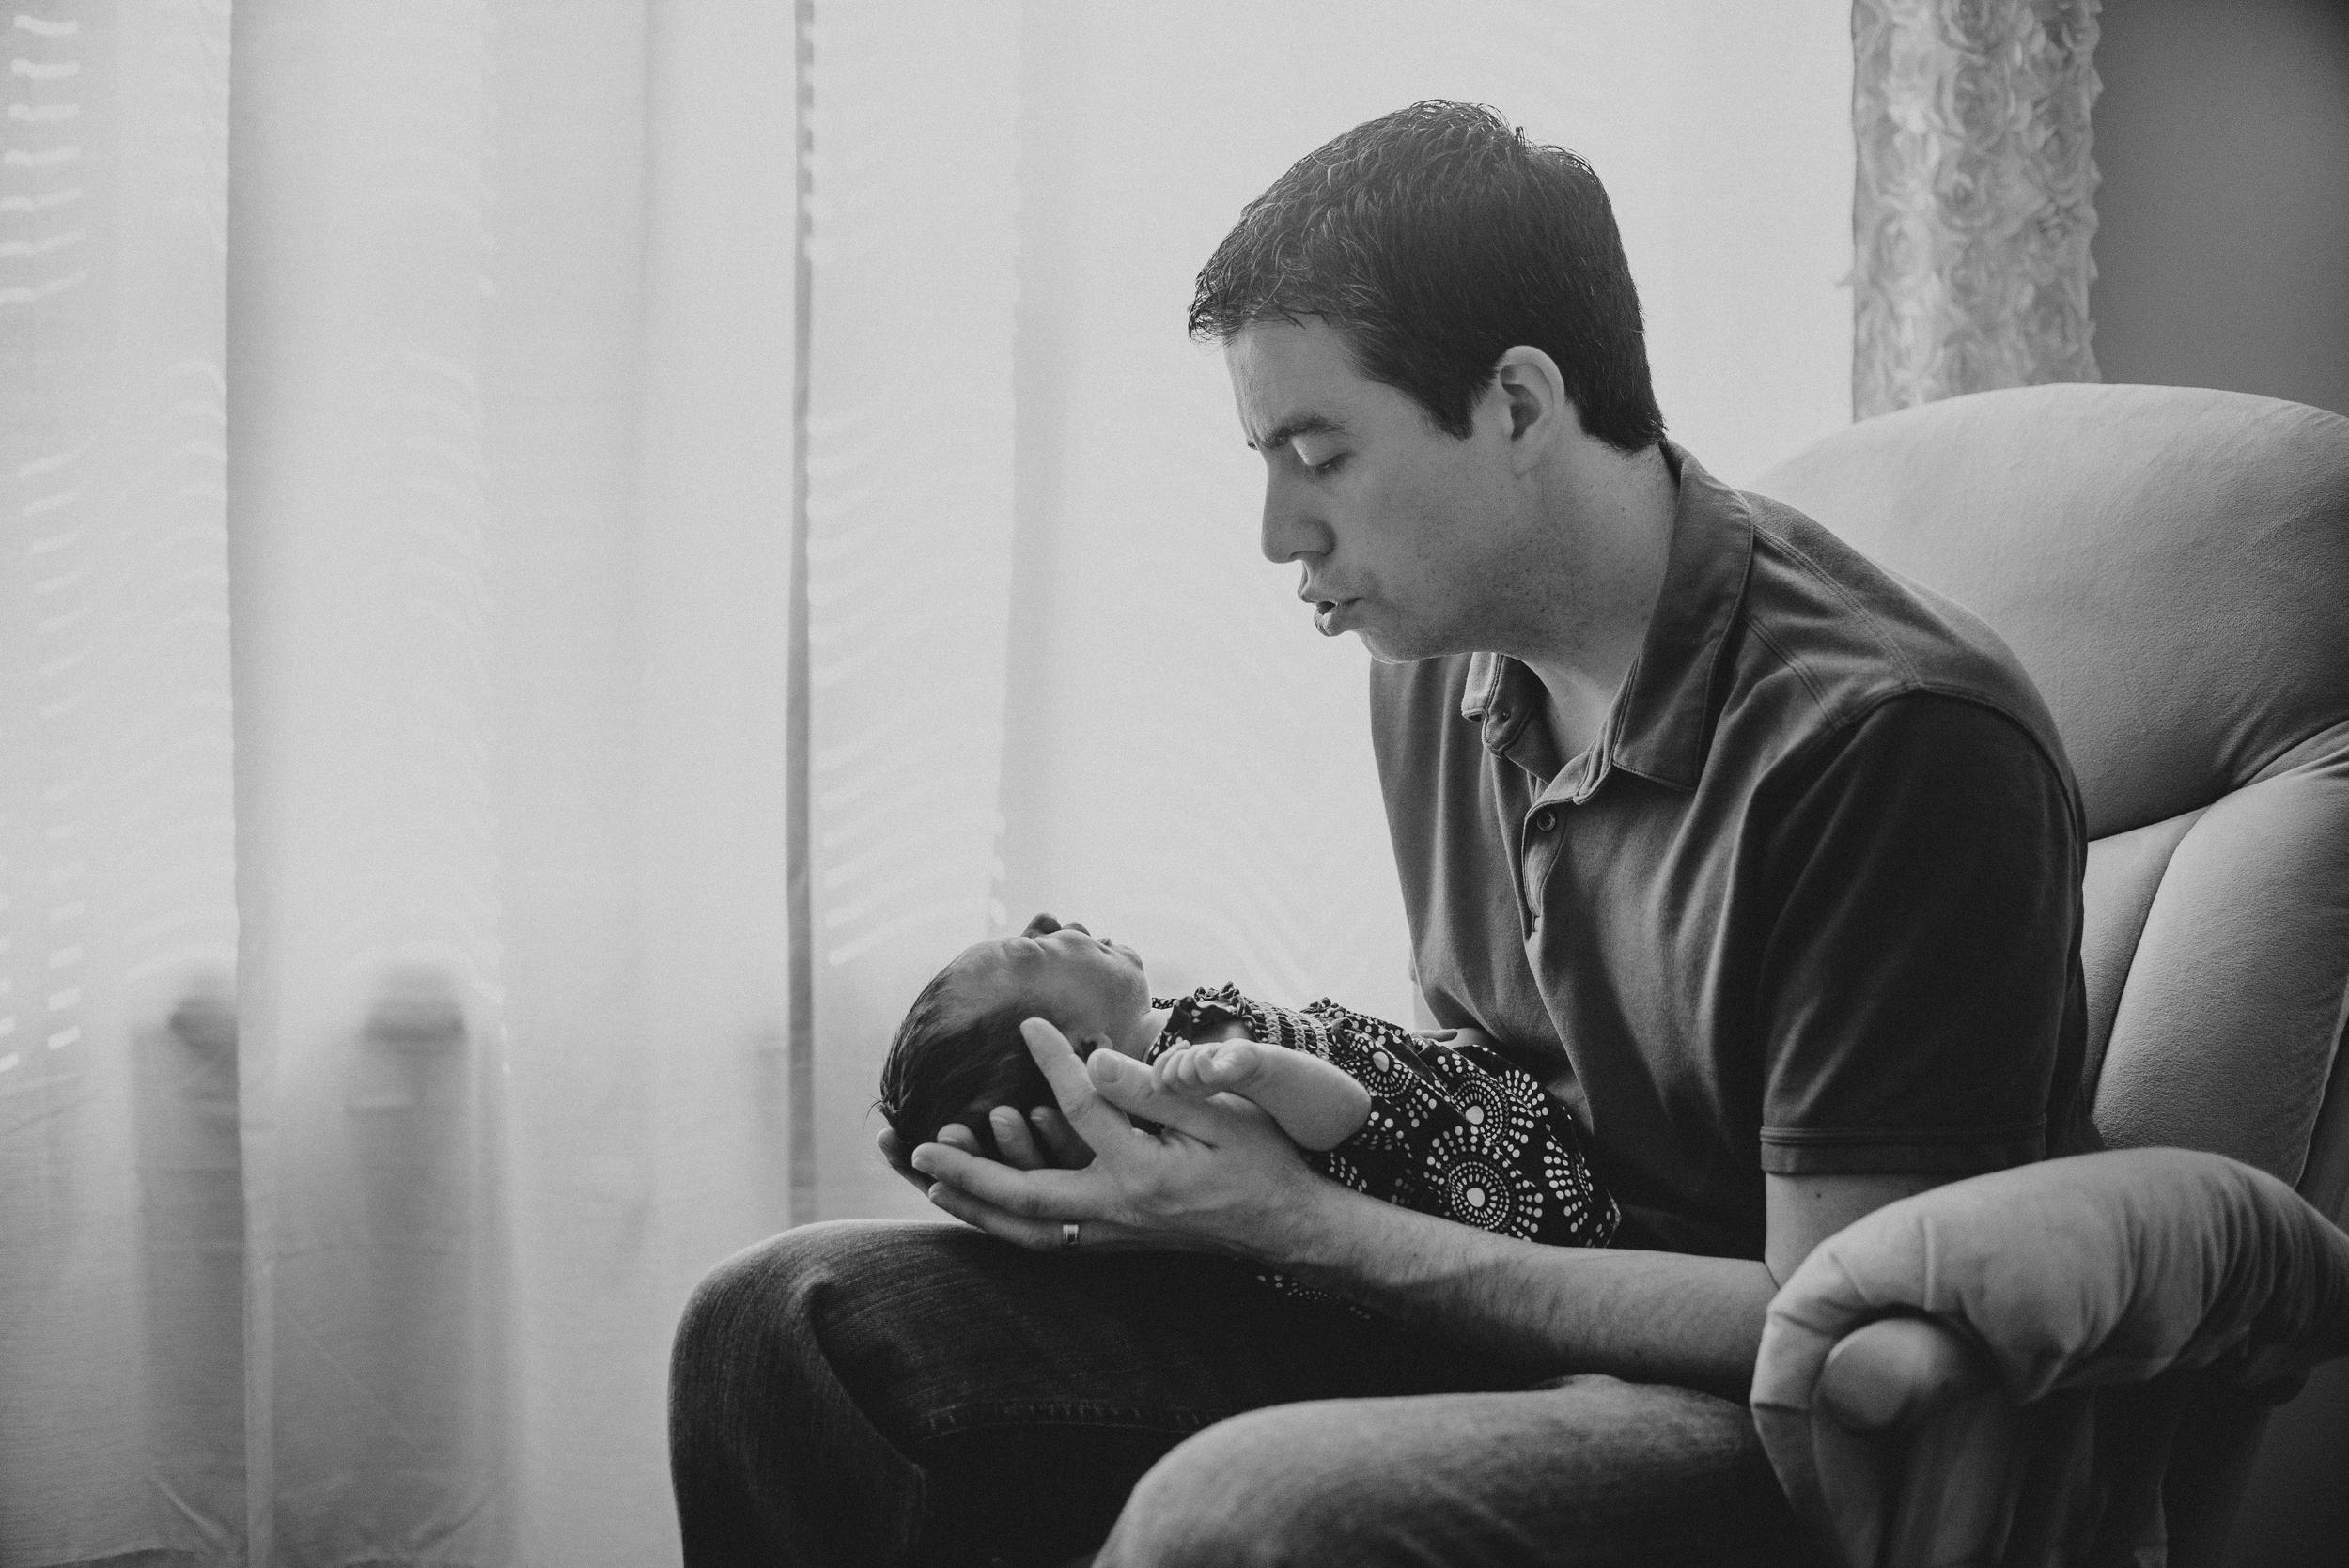 Megan Fuss Photography Western Mass Springfield Lowell Lifestyle Newborn Photographer Baby Session 00012.jpg